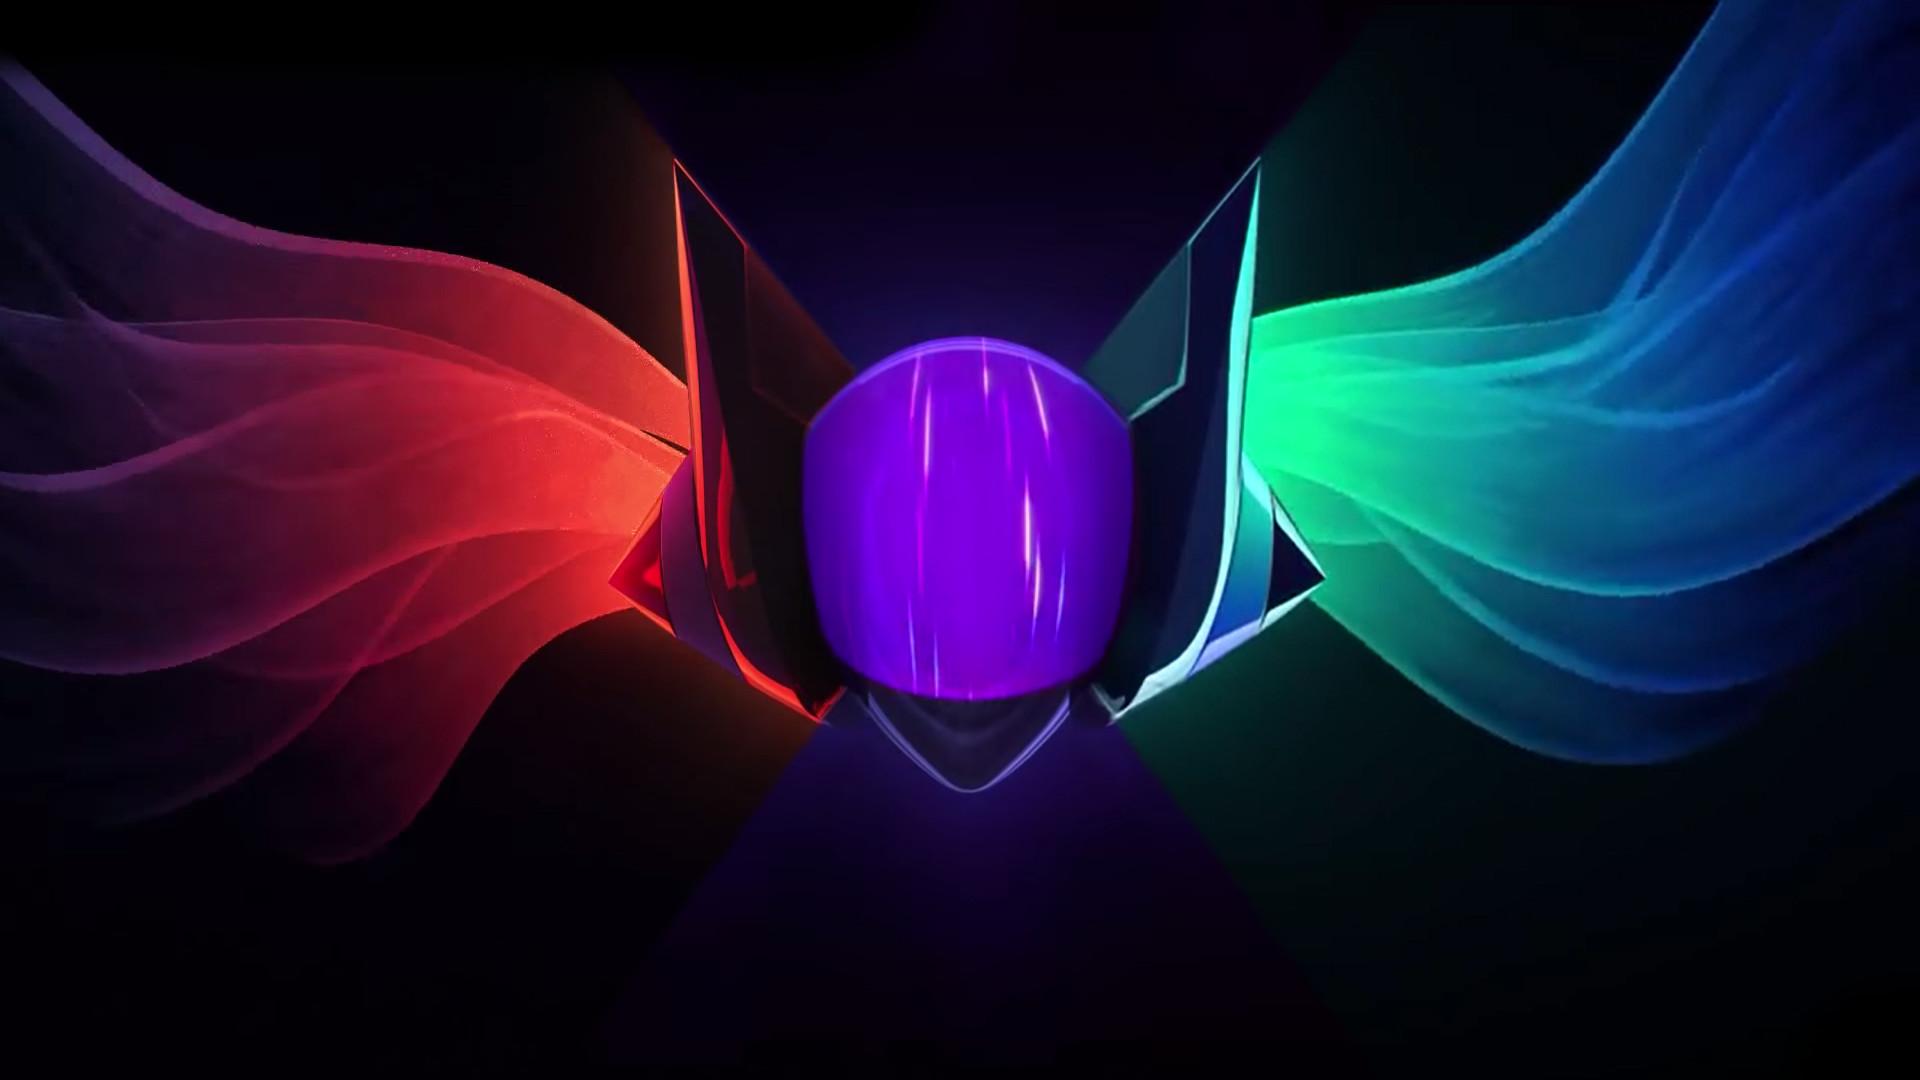 … DJ Sona Wallpaper (Concussive, Ethereal, Kinetic) by rjgtav